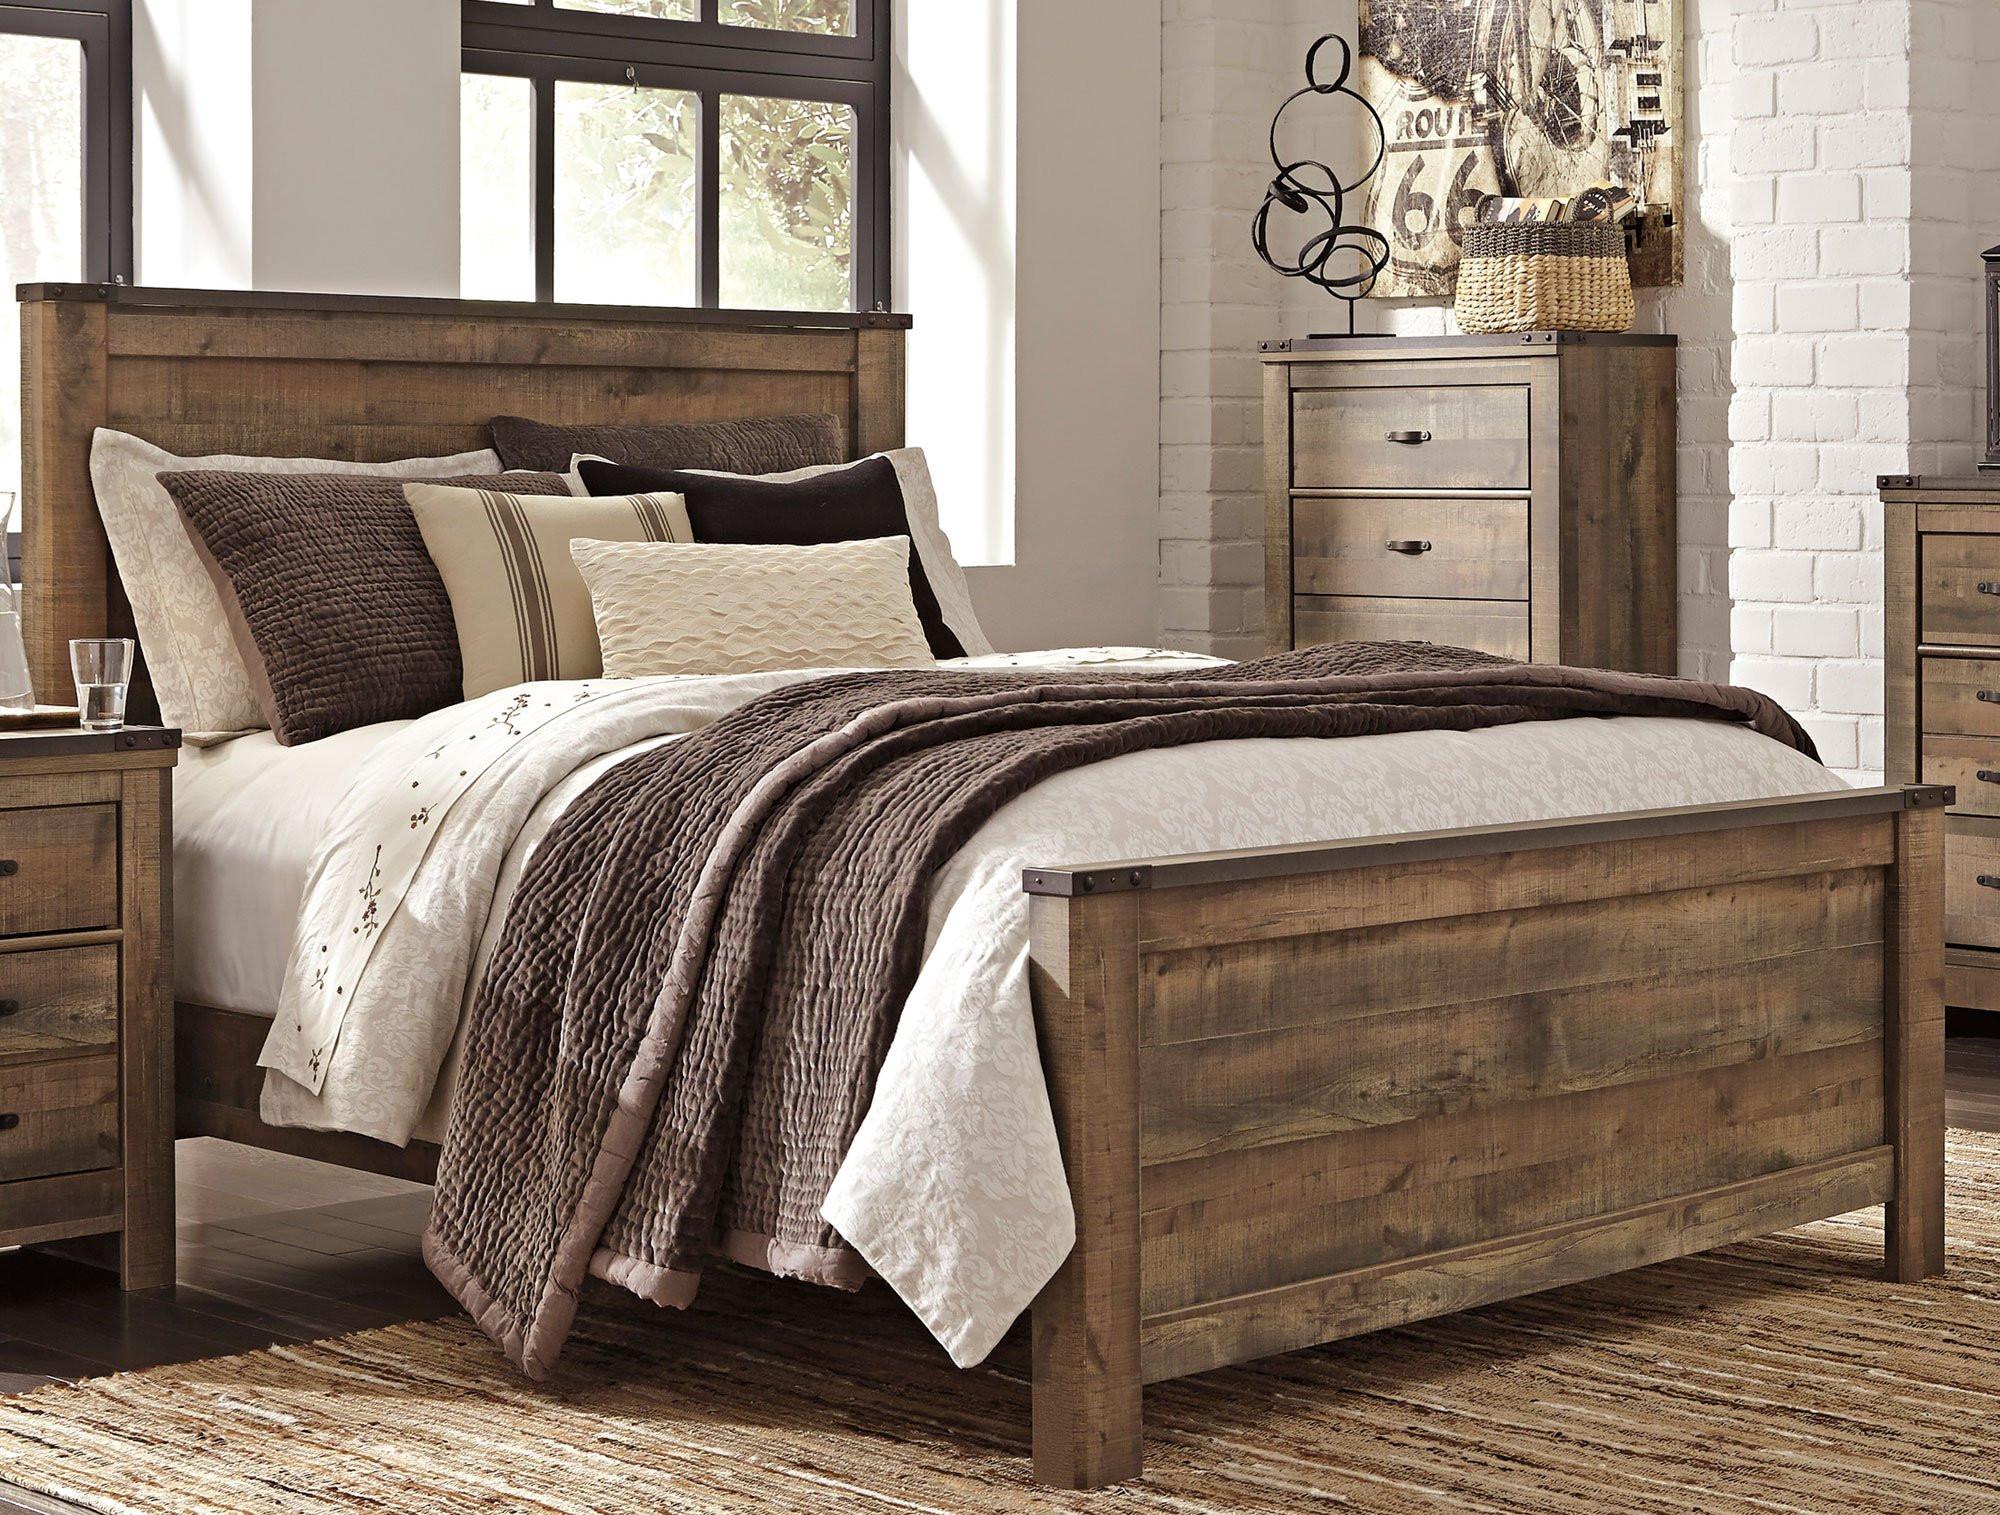 Rustic Bedroom Set King Luxury Rustic Casual Contemporary 6 Piece King Bedroom Set